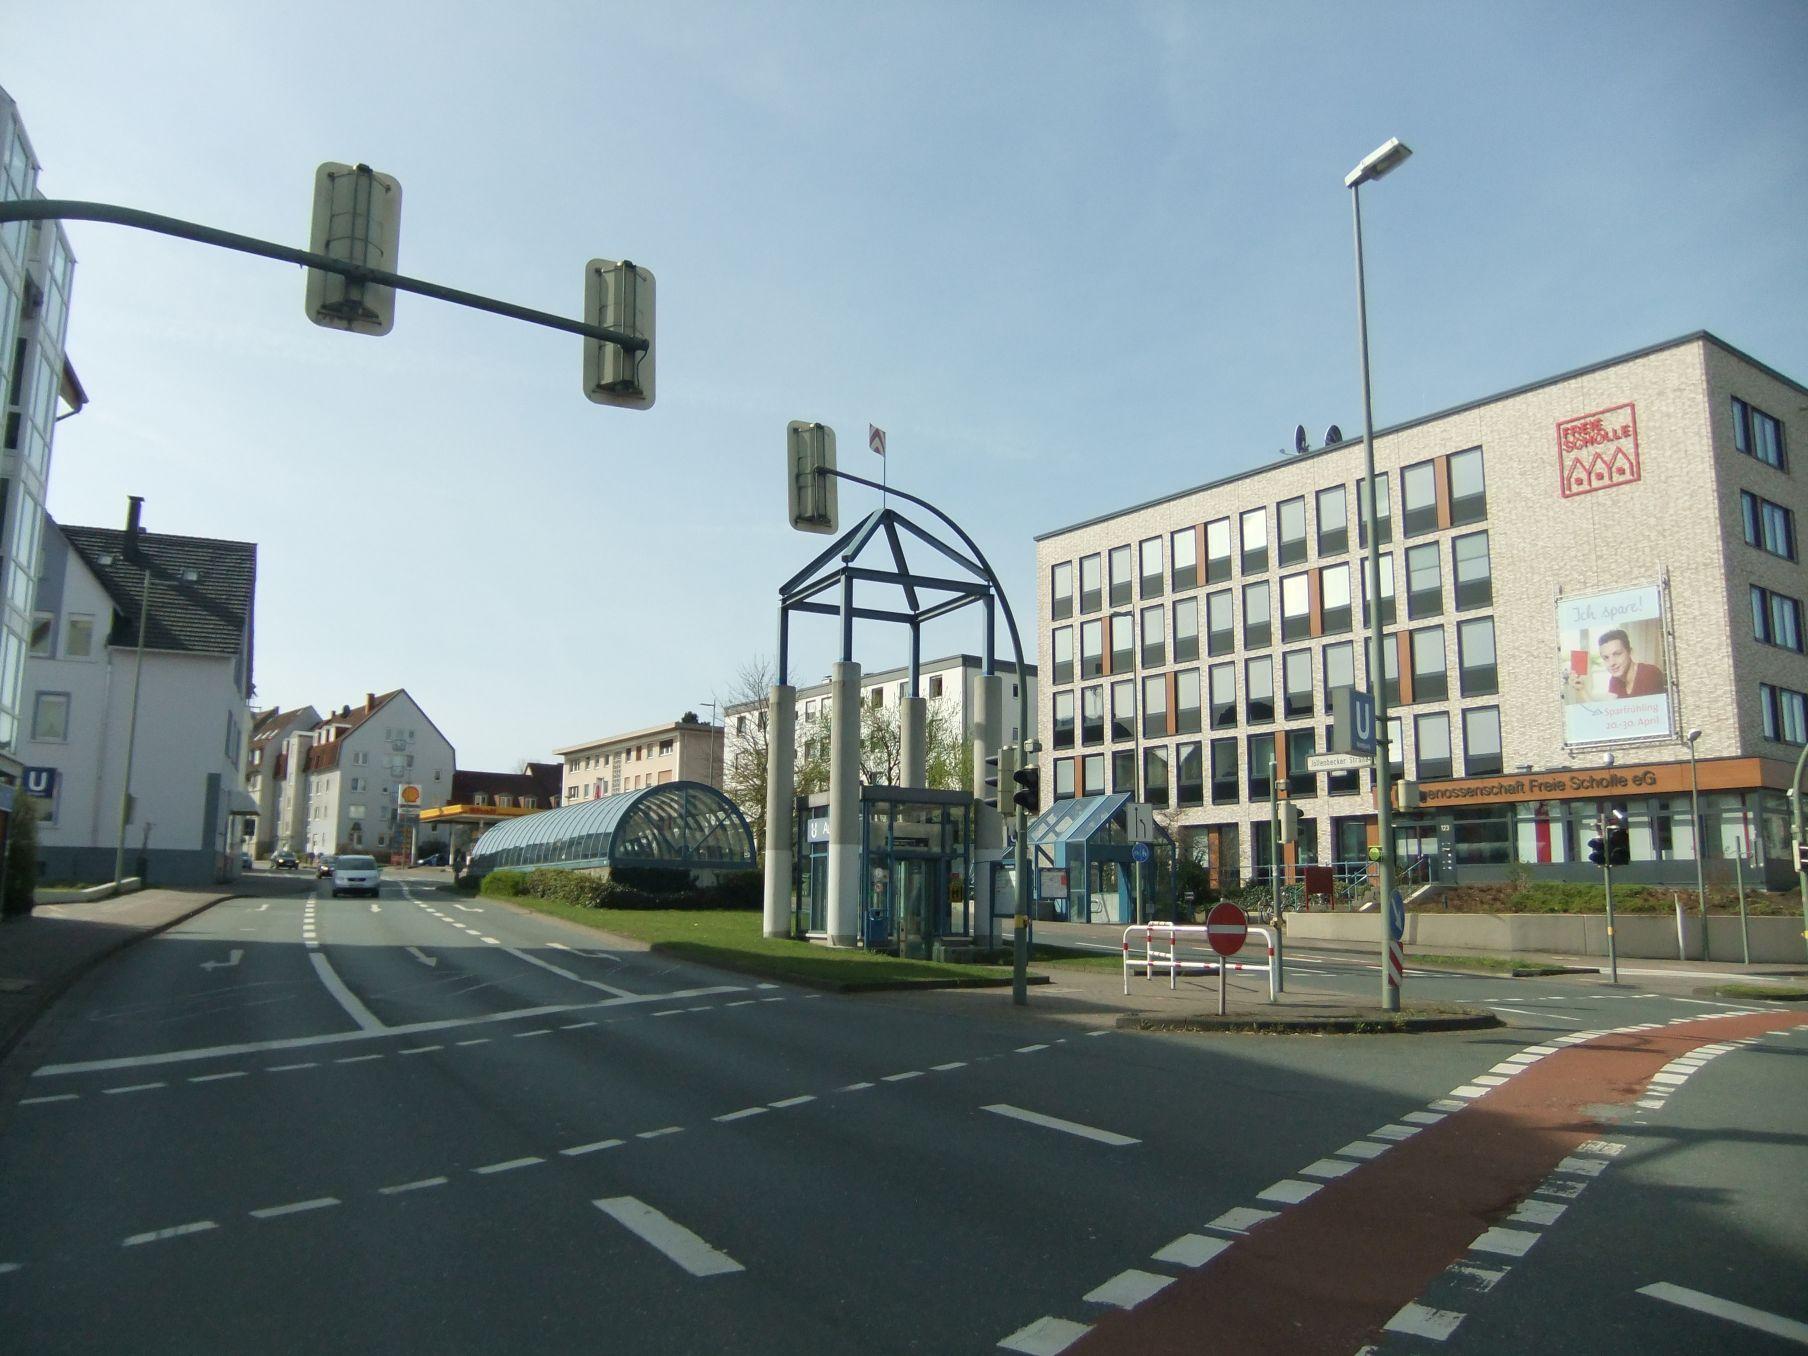 FileUBahnhof Nordpark BielefeldJPG  Wikimedia Commons